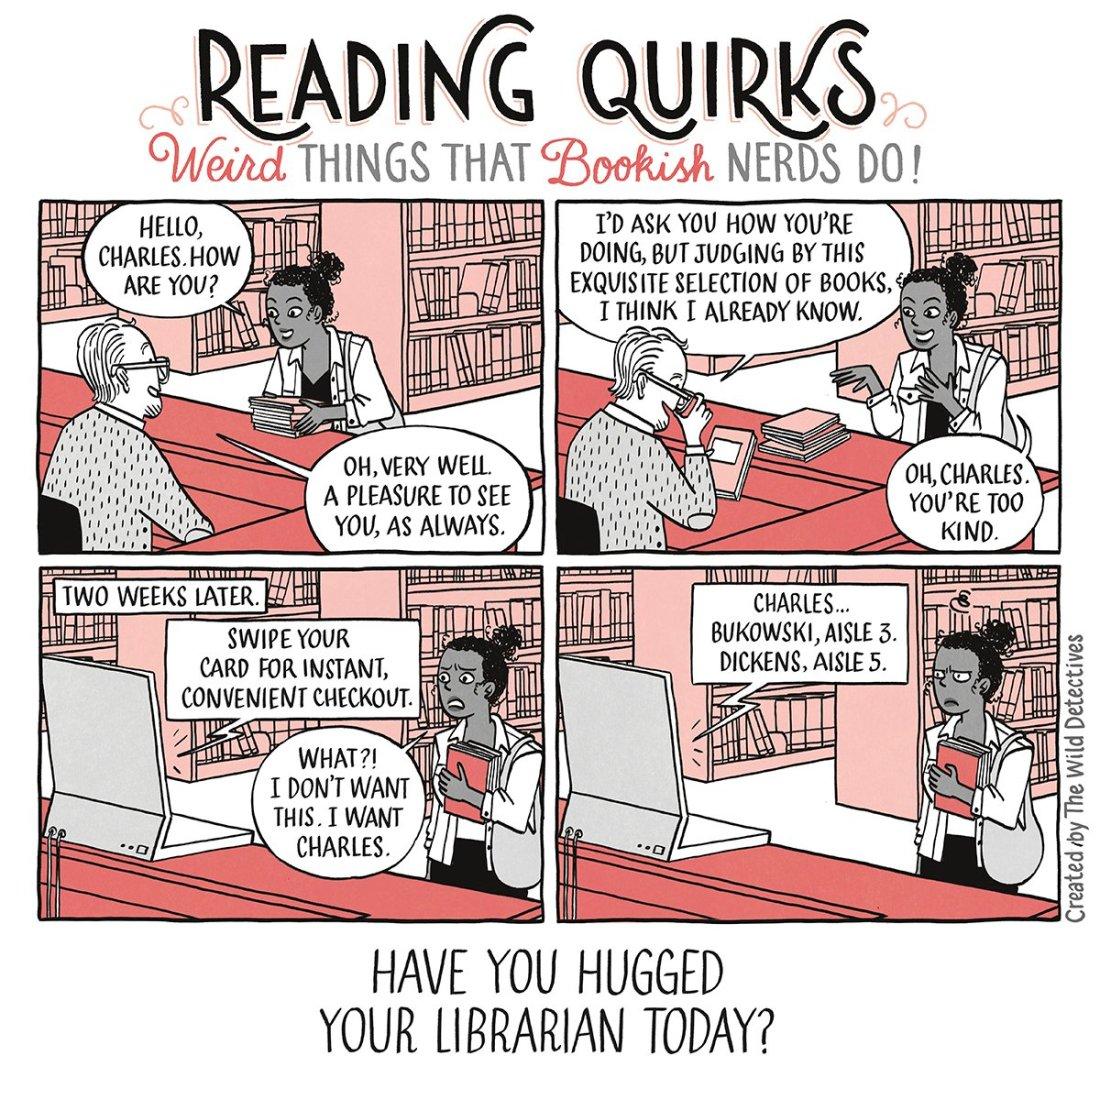 Book Quirks